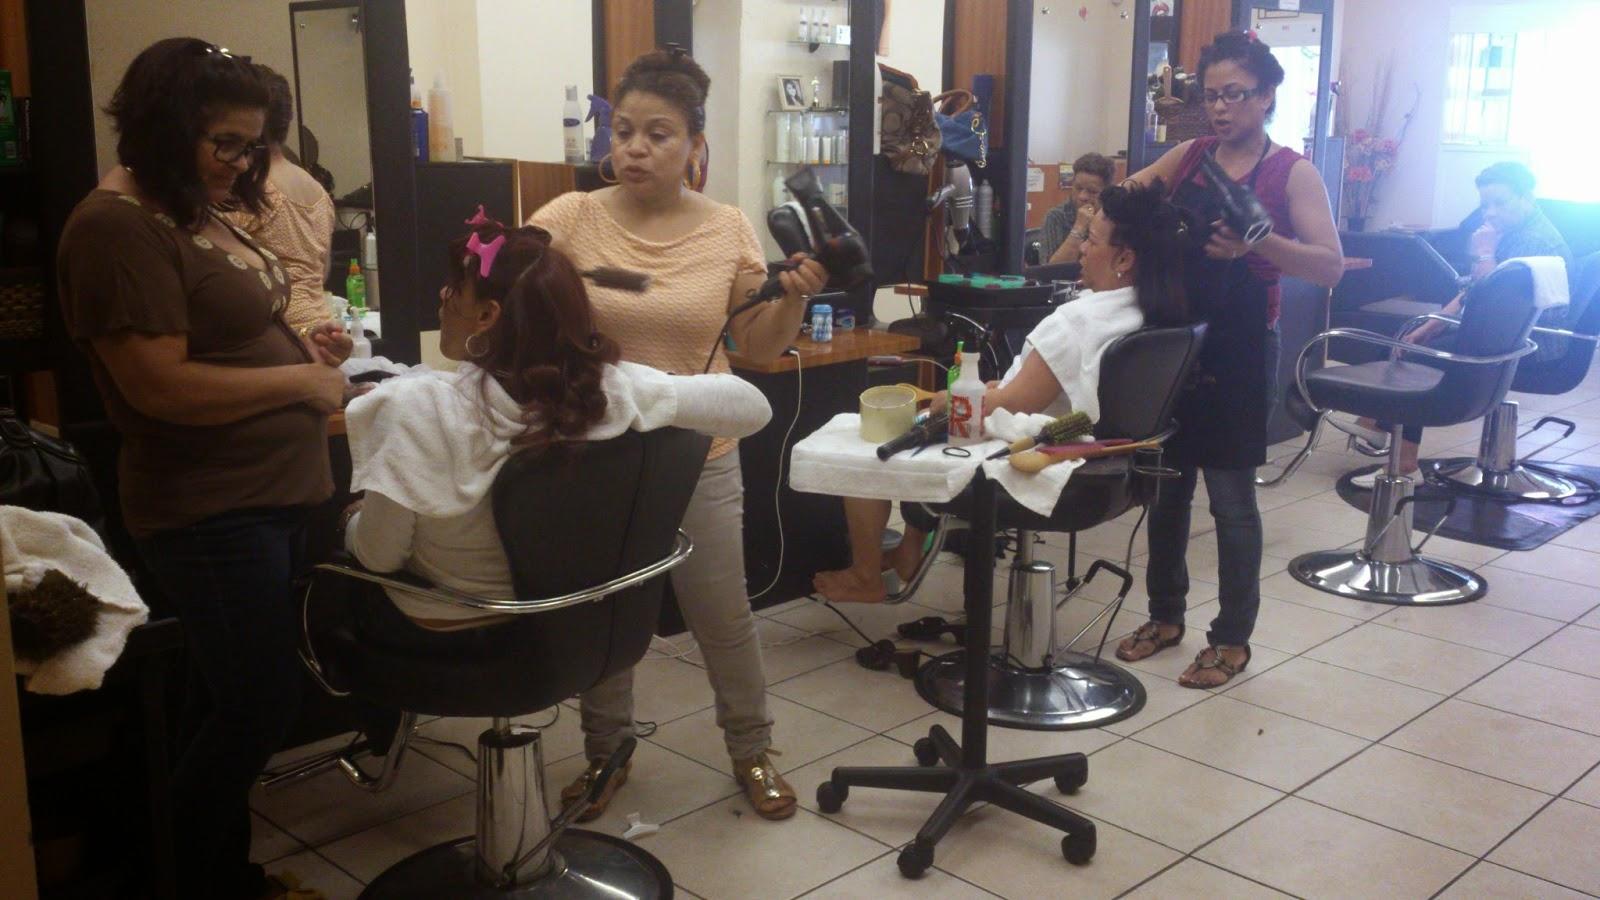 Mery's Beauty Salon & Spa, 209 Main St, Milford, MA 01757, Estados Unidos.